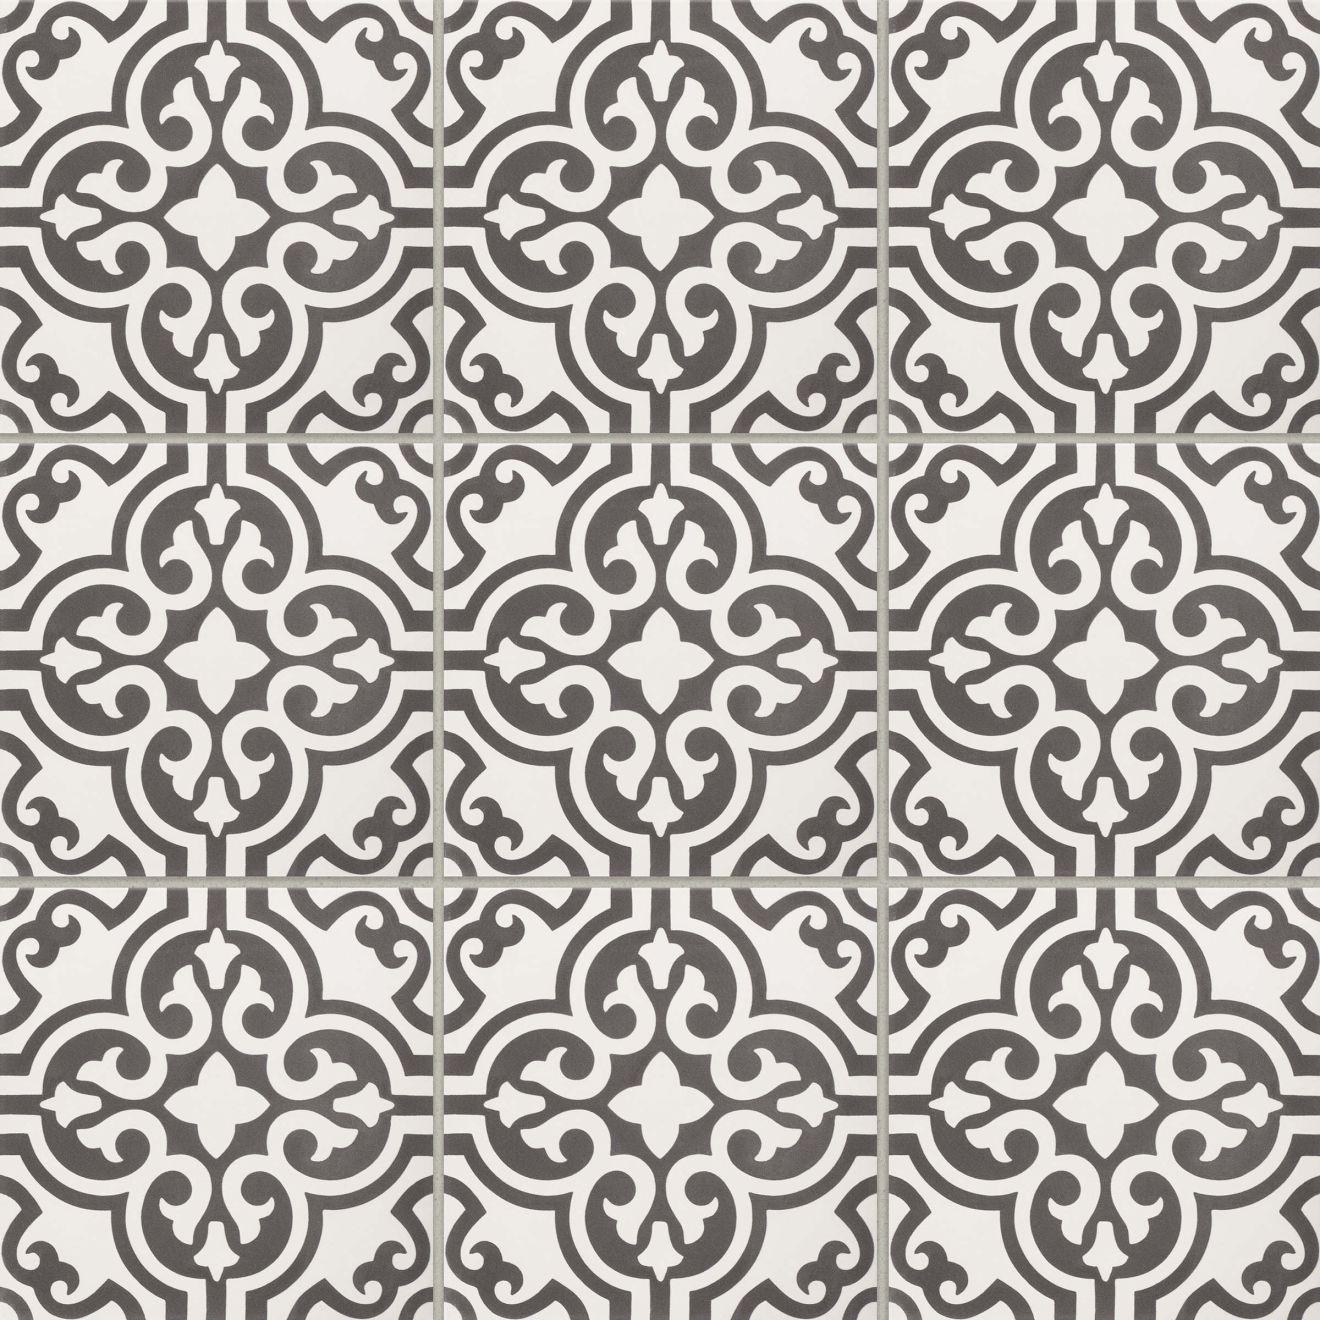 "Remy 8"" x 8"" Floor & Wall Tile in Nouveaux"